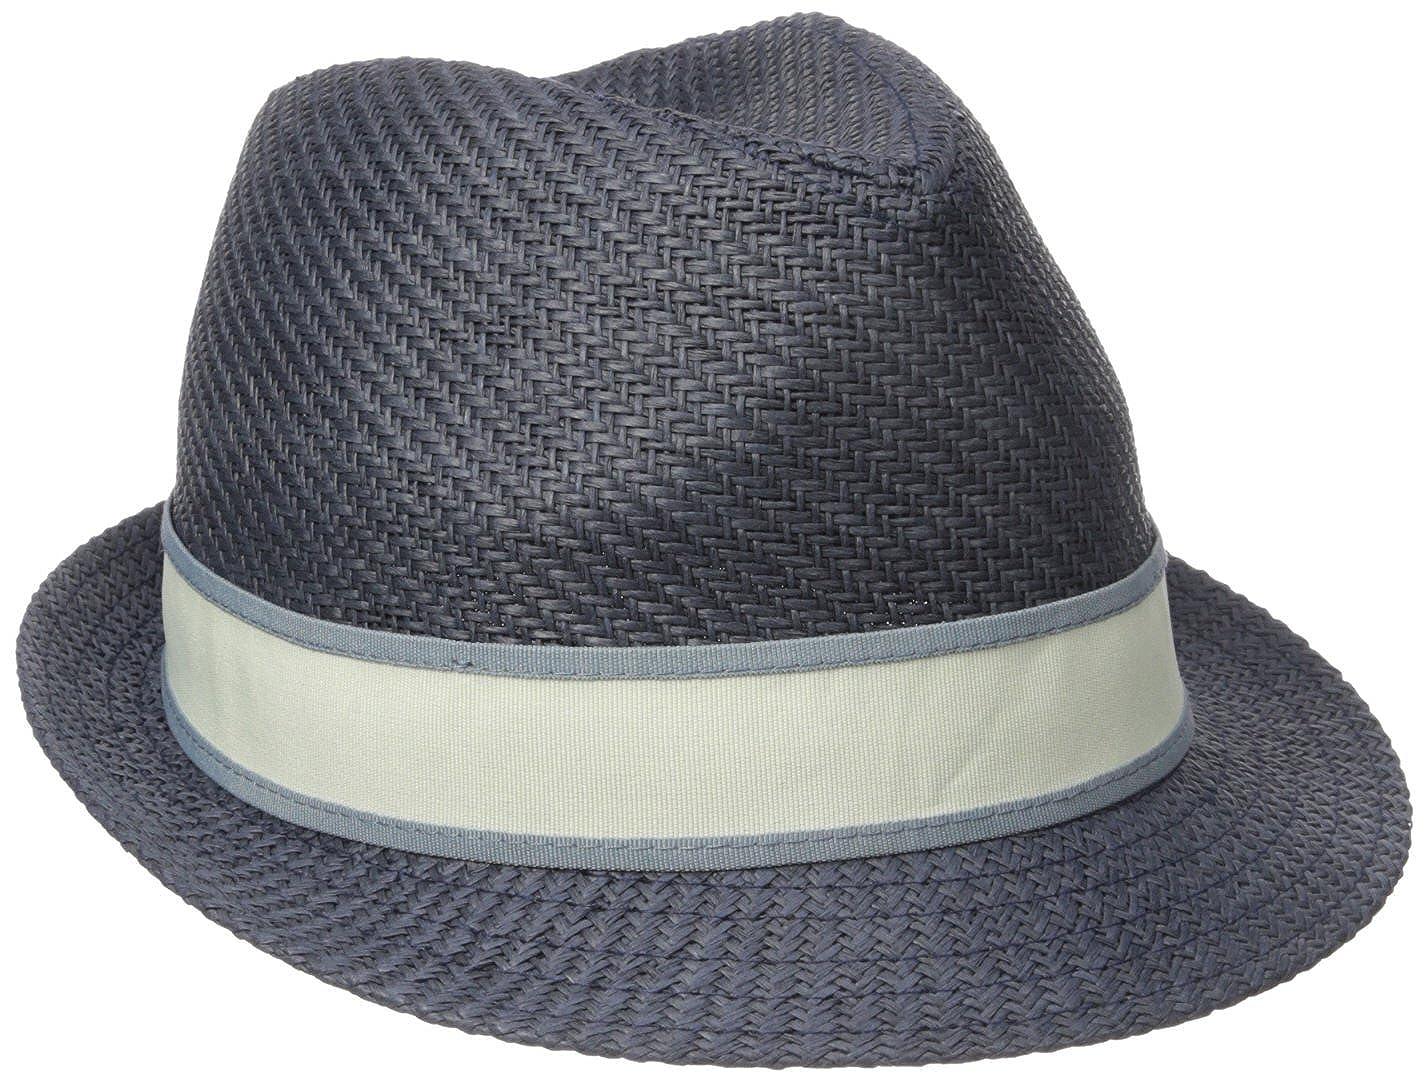 68794fbd Goorin Bros. Men's Killian Fedora at Amazon Men's Clothing store: